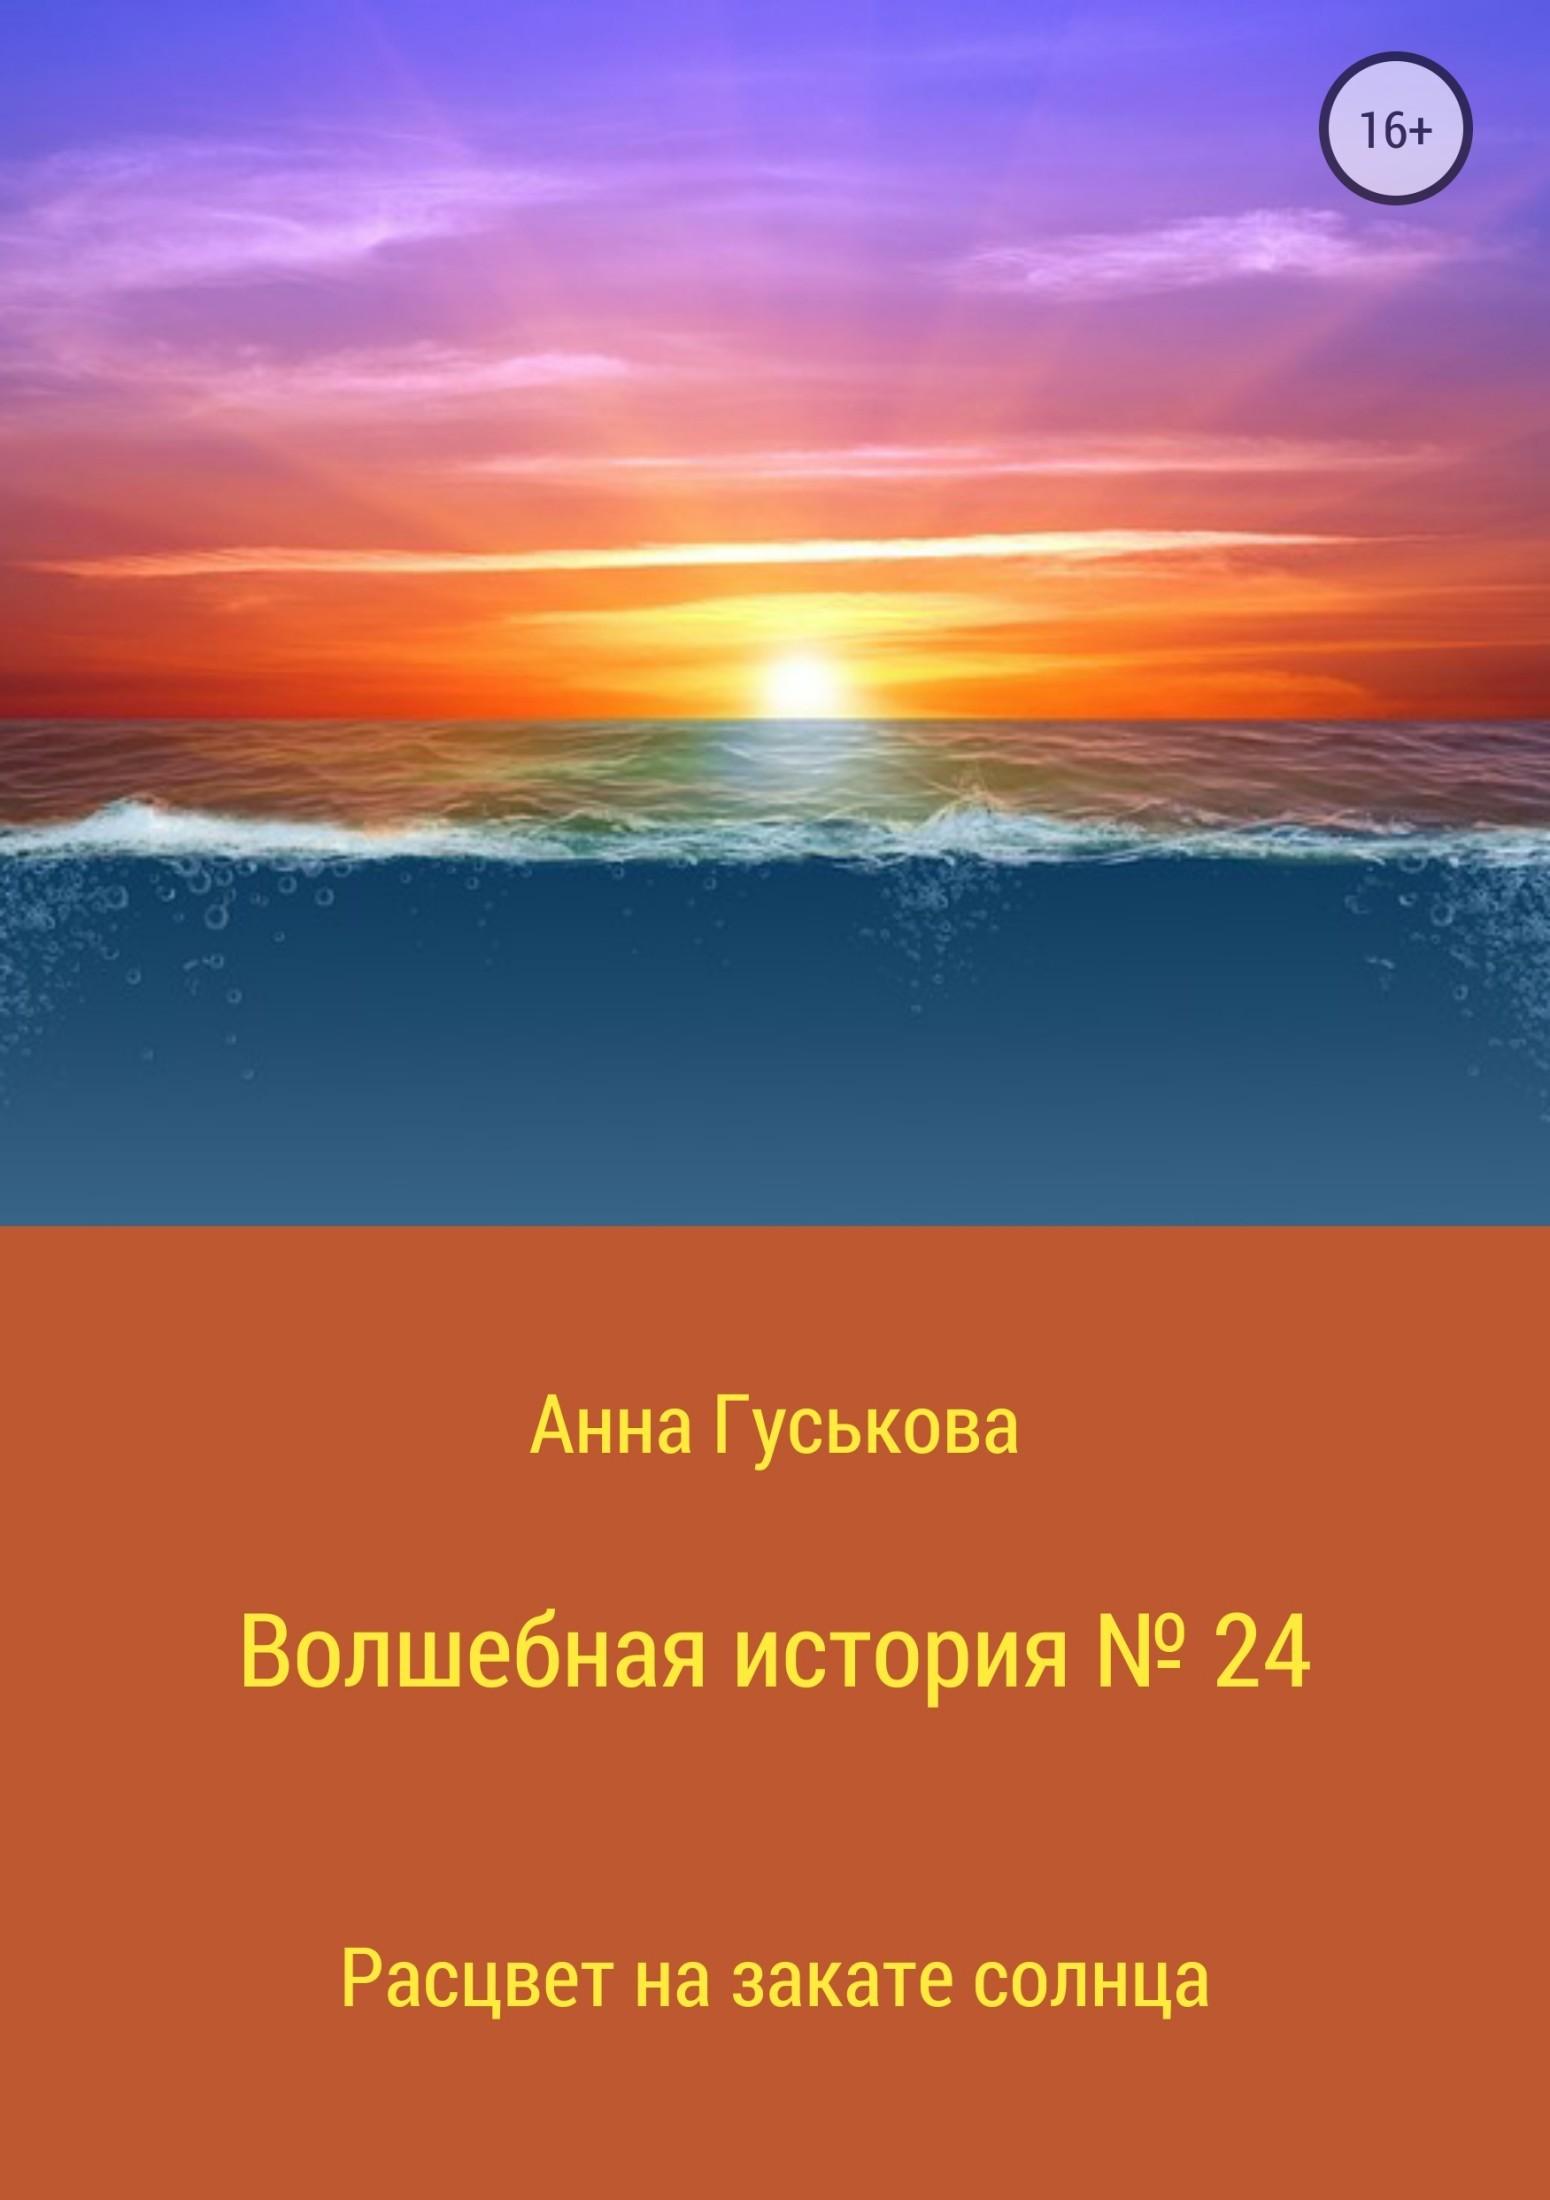 Волшебная история № 24. Расцвет на закате солнца